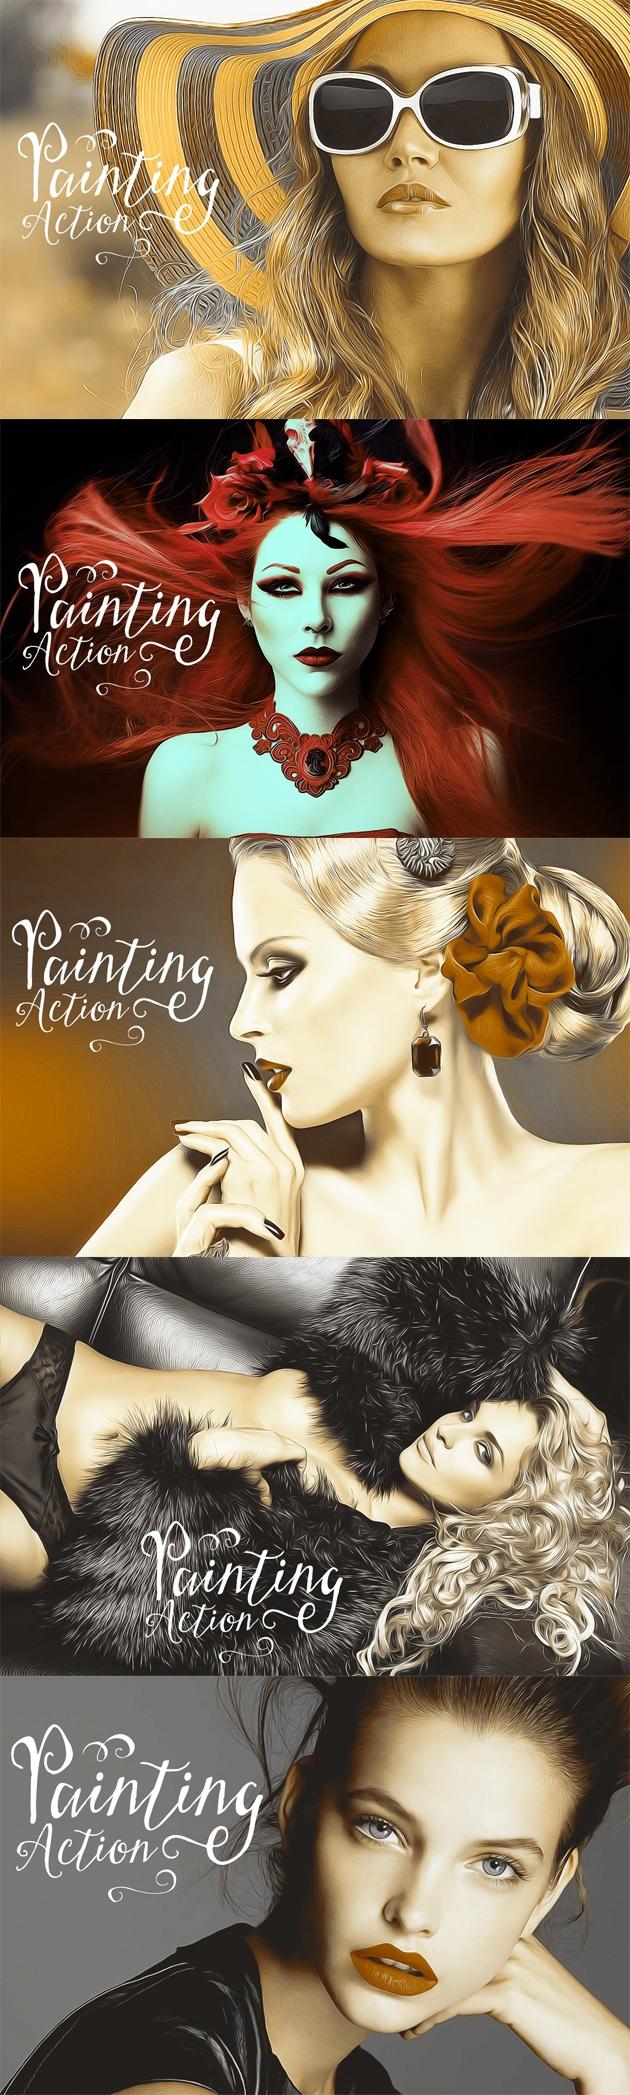 bundle Pack modern action Photo effect popular action art artwork Exposure double double exposure digital panting dry brush Oil Painting